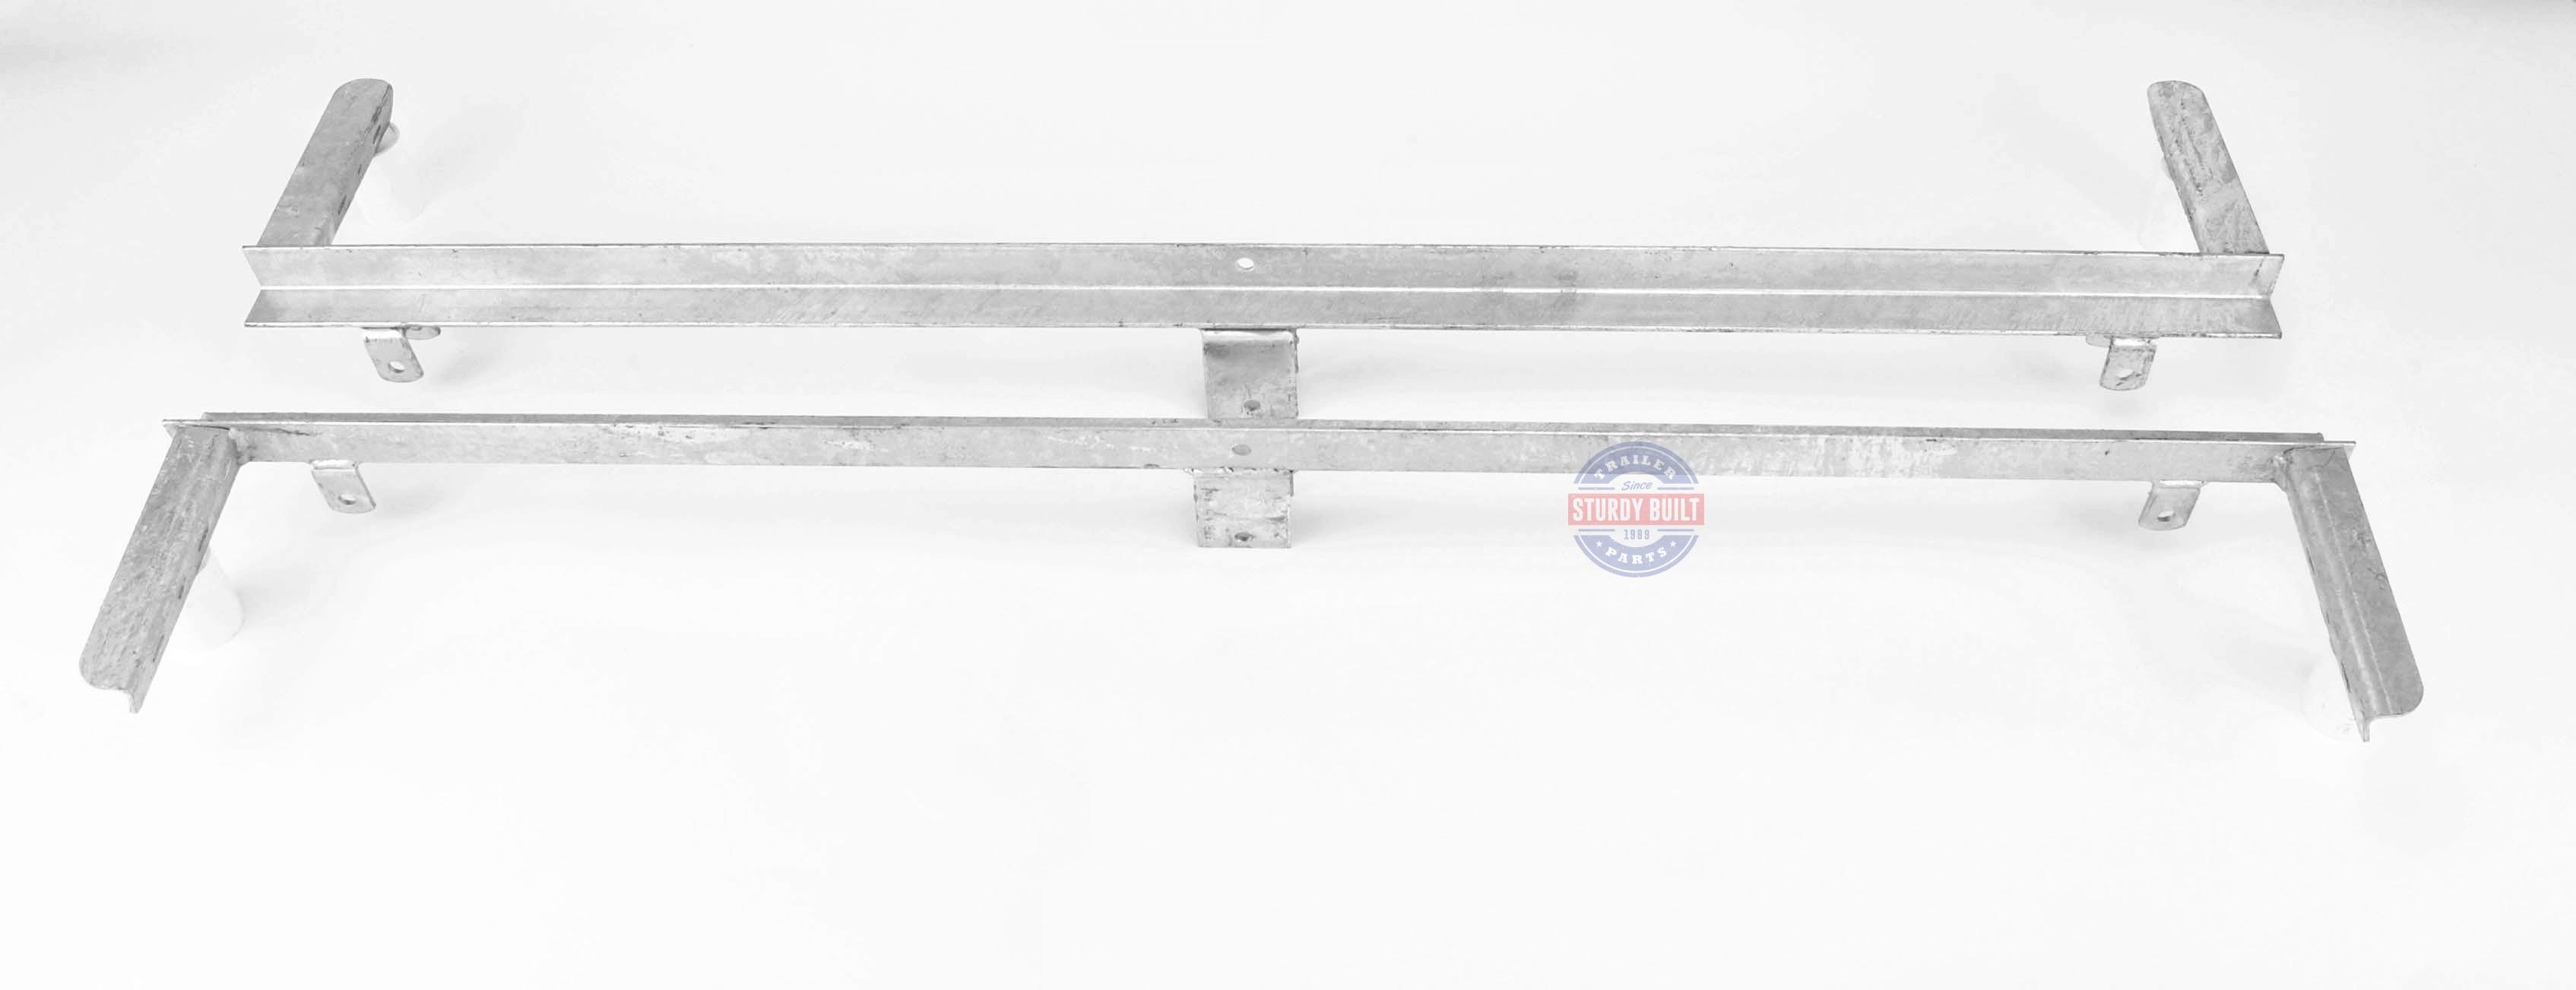 boat trailer single or dual axle gm radio theft lock leaf spring slider tandem pair for 25 1